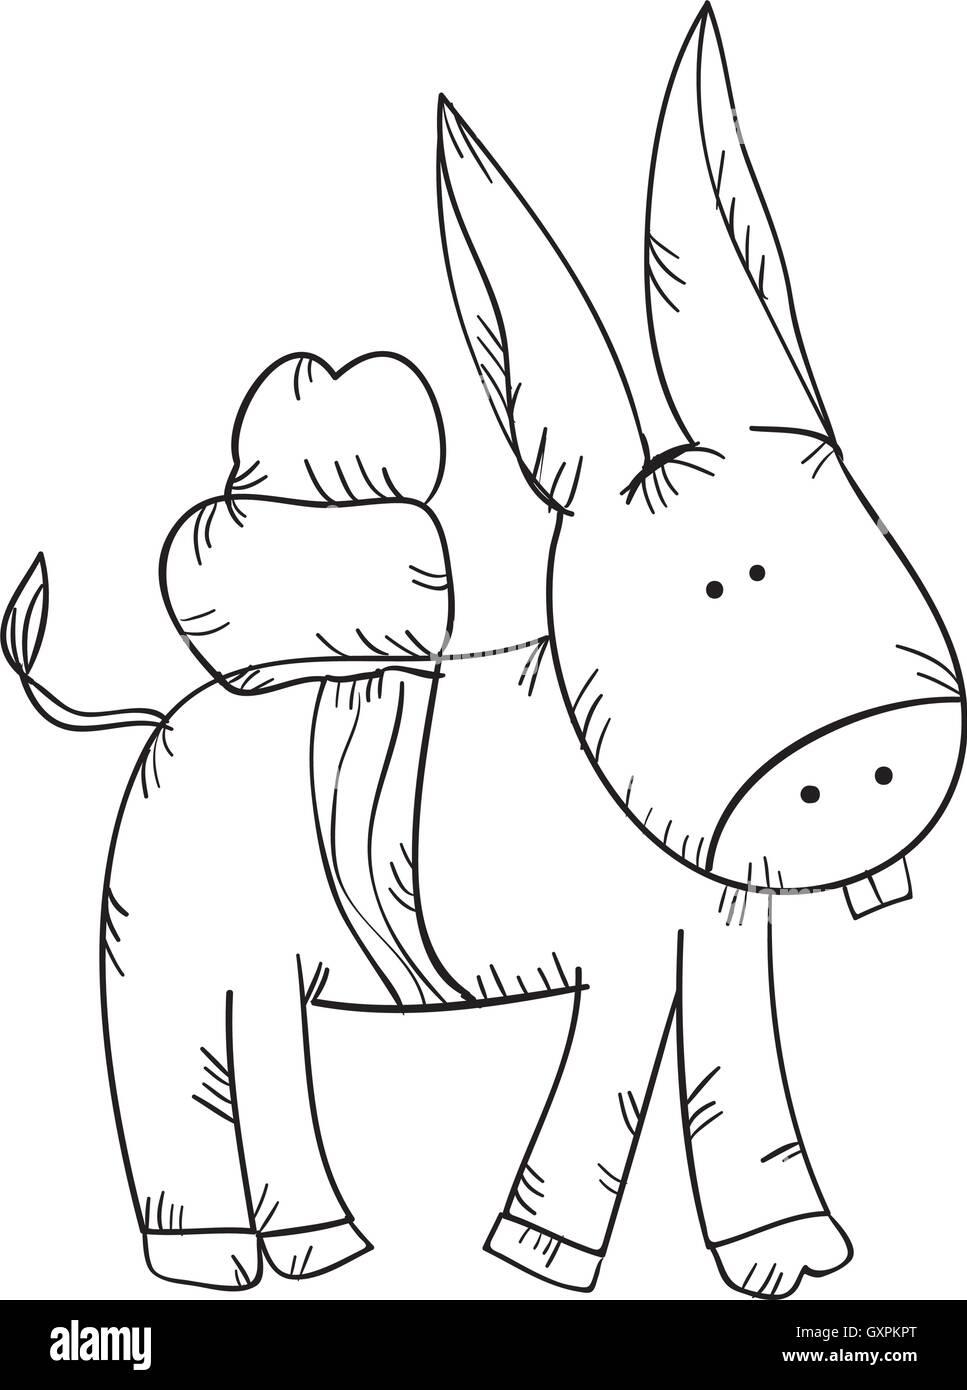 happy donkey black and white stock photos images alamy All Breeds Miniature Animals donkey animal drawn design stock image